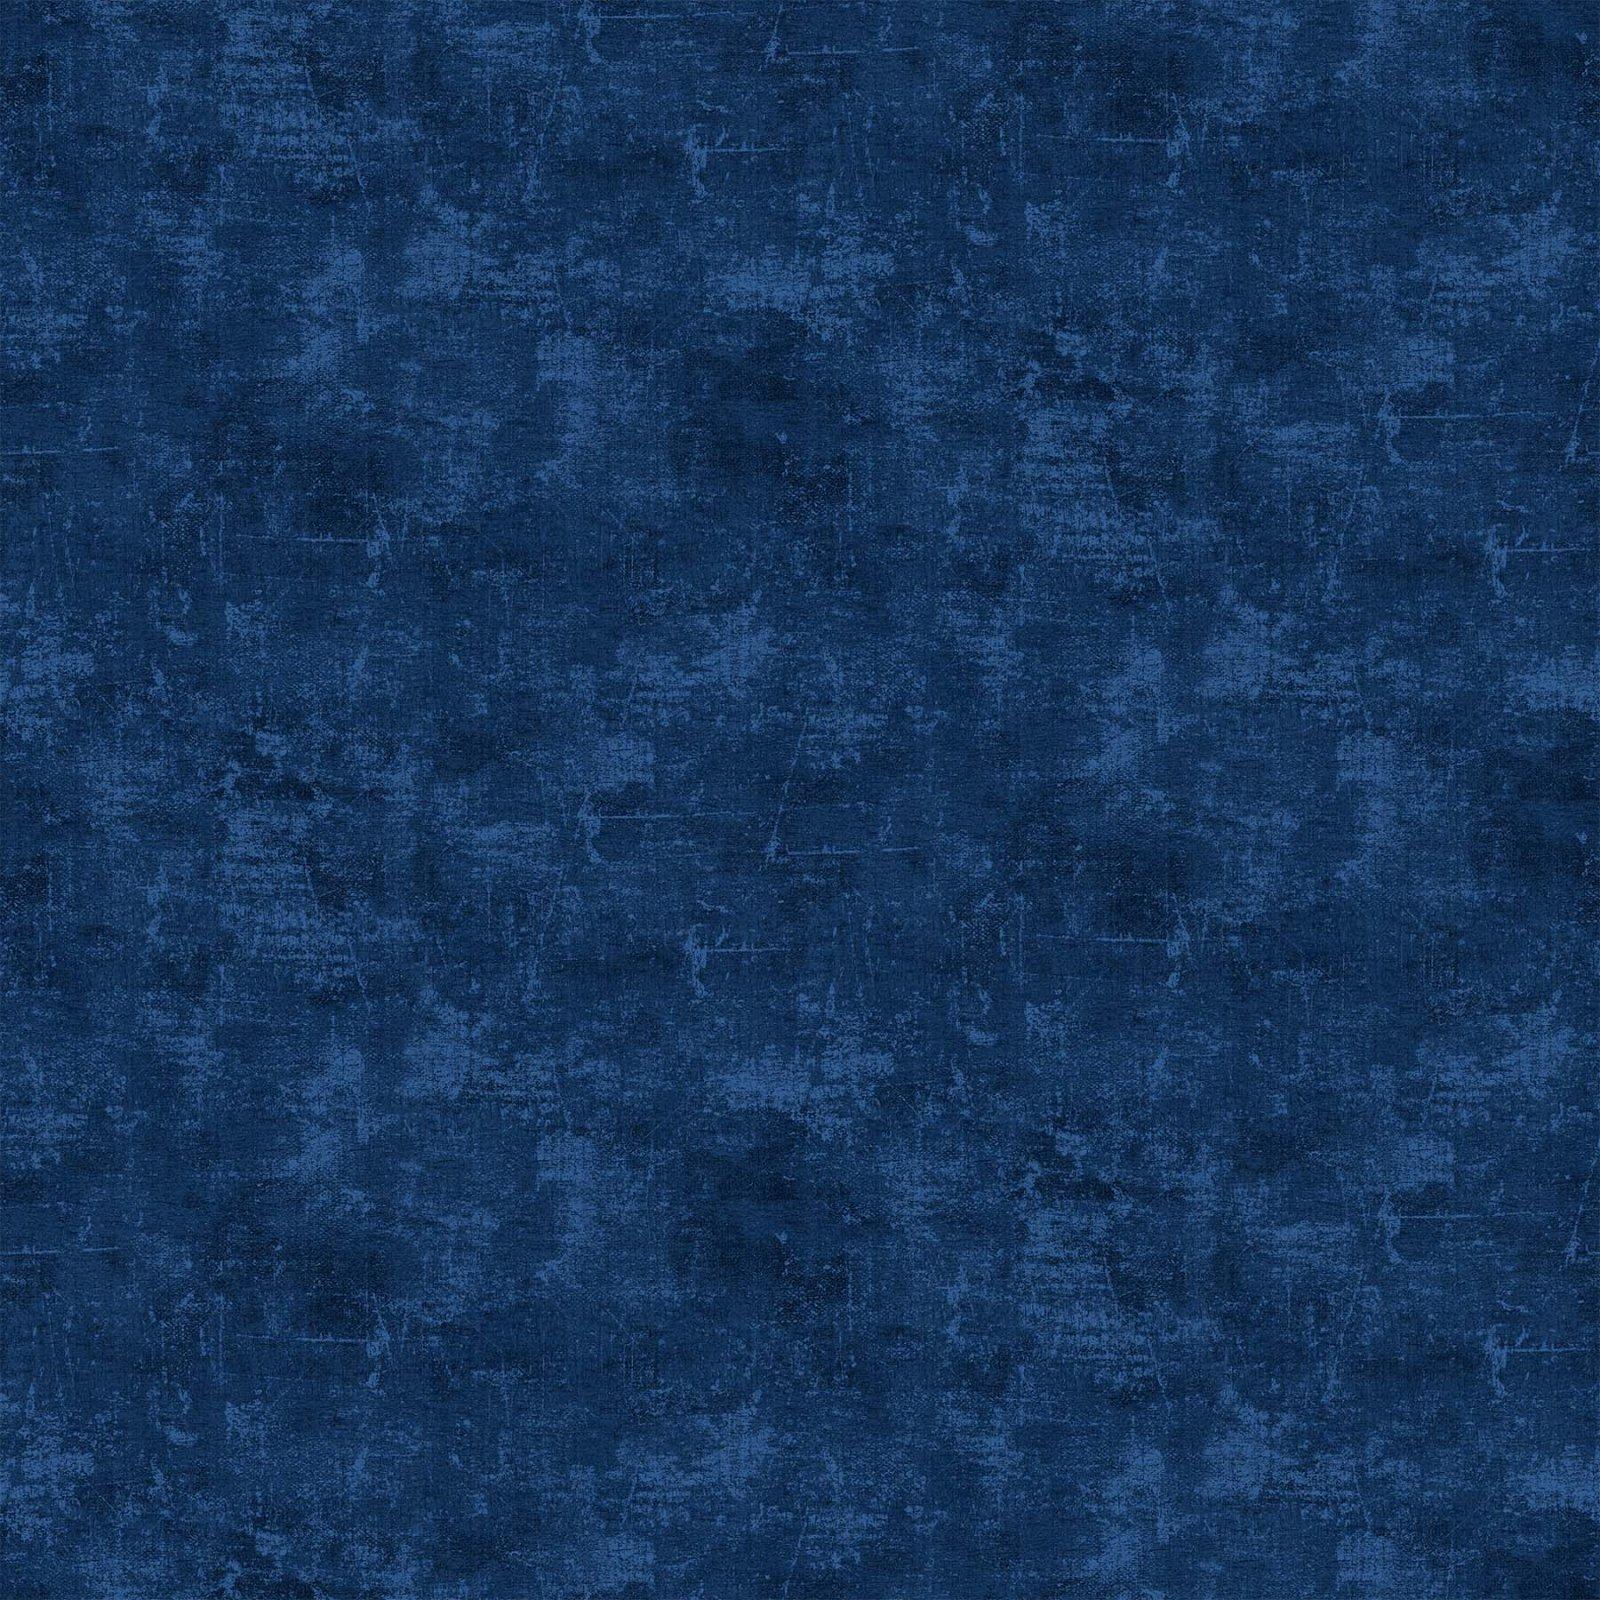 Canvas 9030-49 by Northcott Fabrics